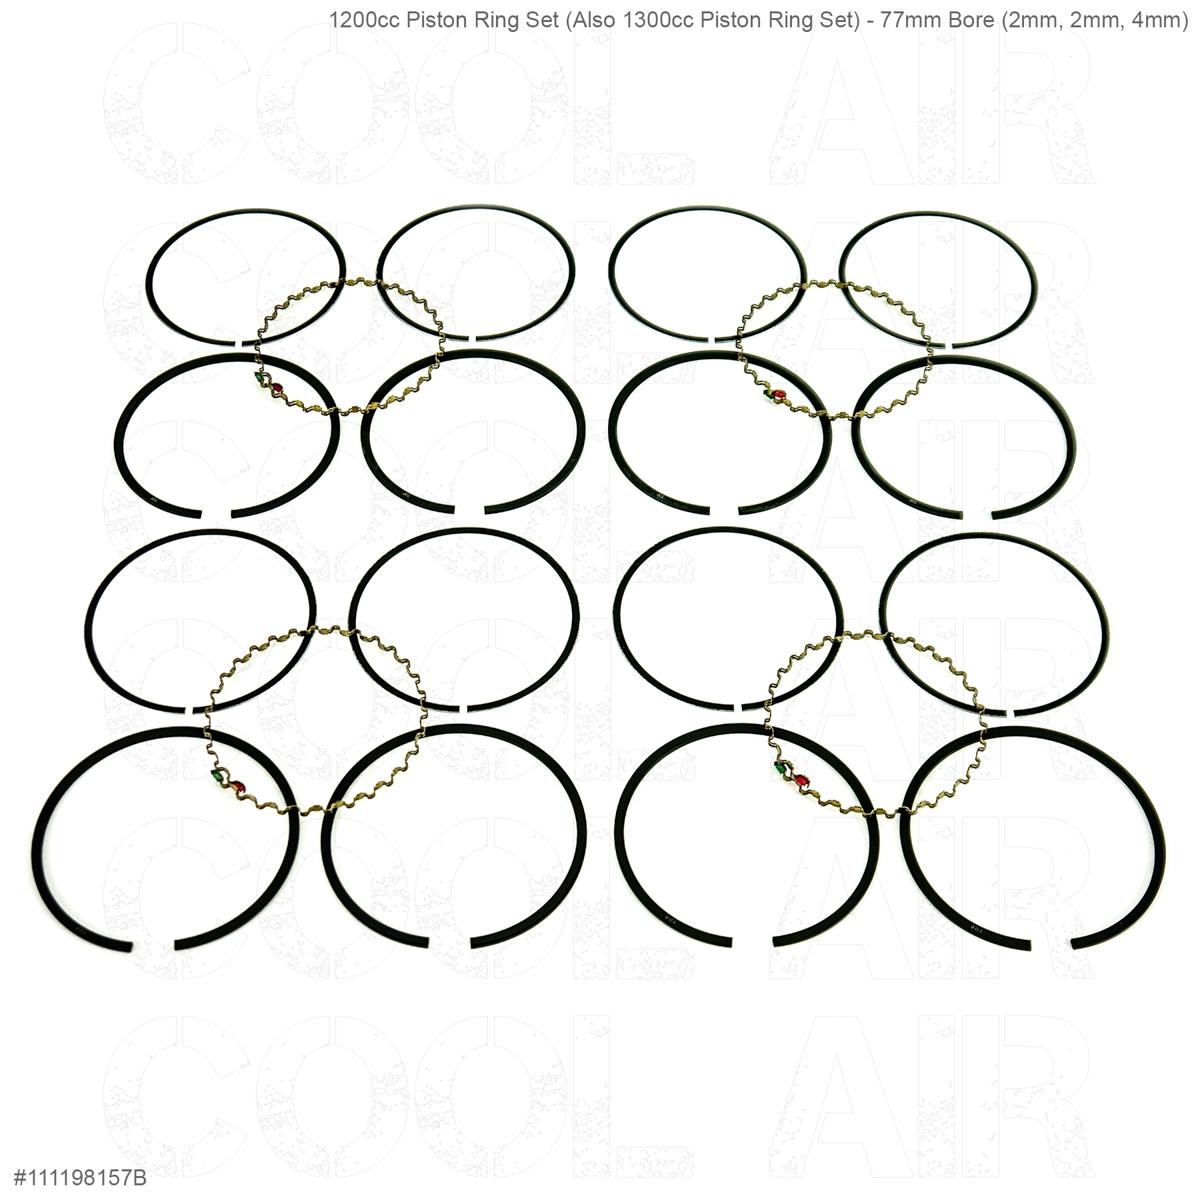 1200cc Piston Ring Set (Also 1300cc Piston Ring Set) - 77mm Bore (2mm, 2mm, 4mm)